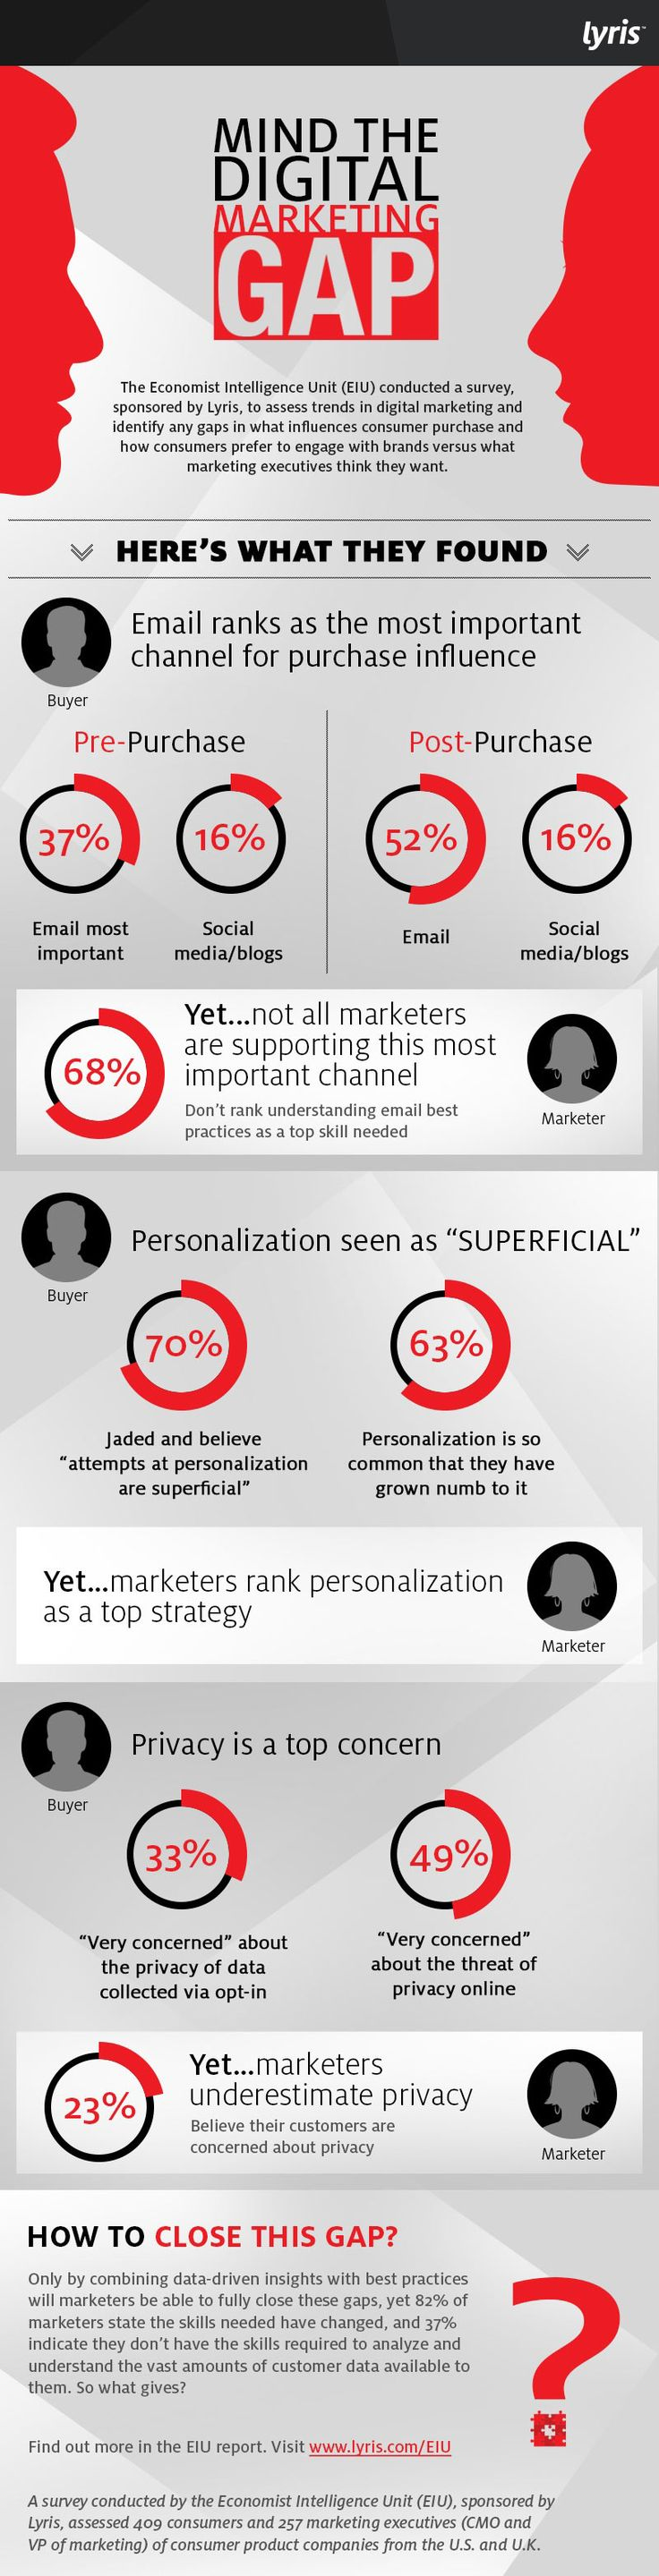 Mind the digital marketing gap – infographic